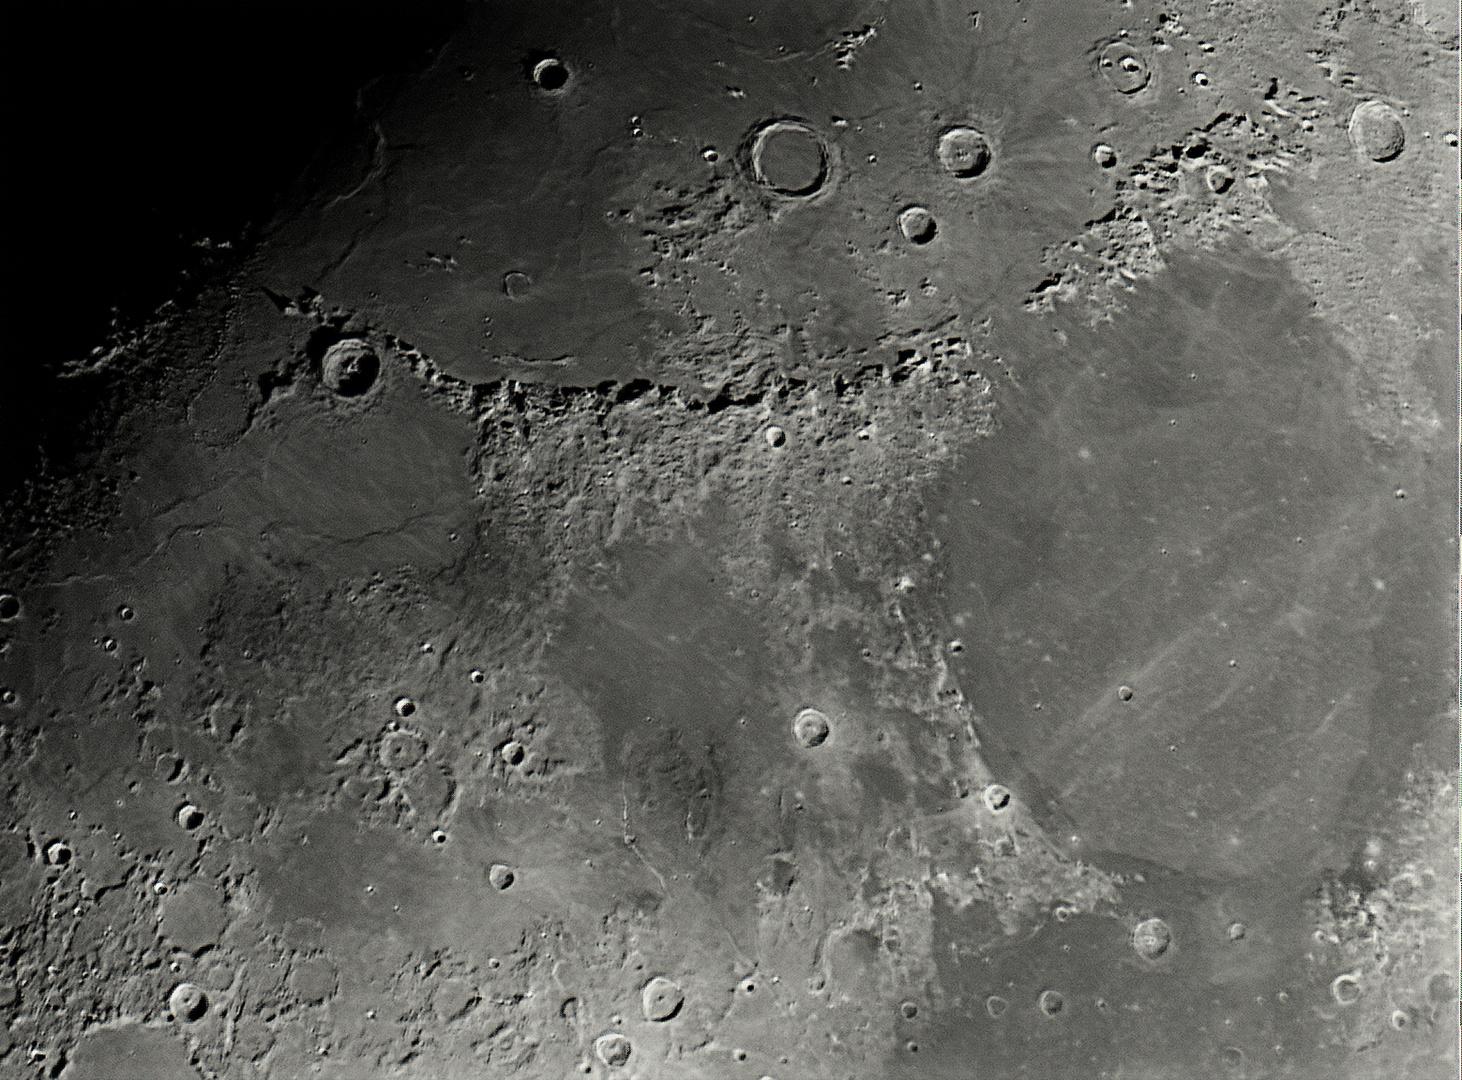 Mare Vaporum-Region am 09.03.2014 um 0:16 Uhr